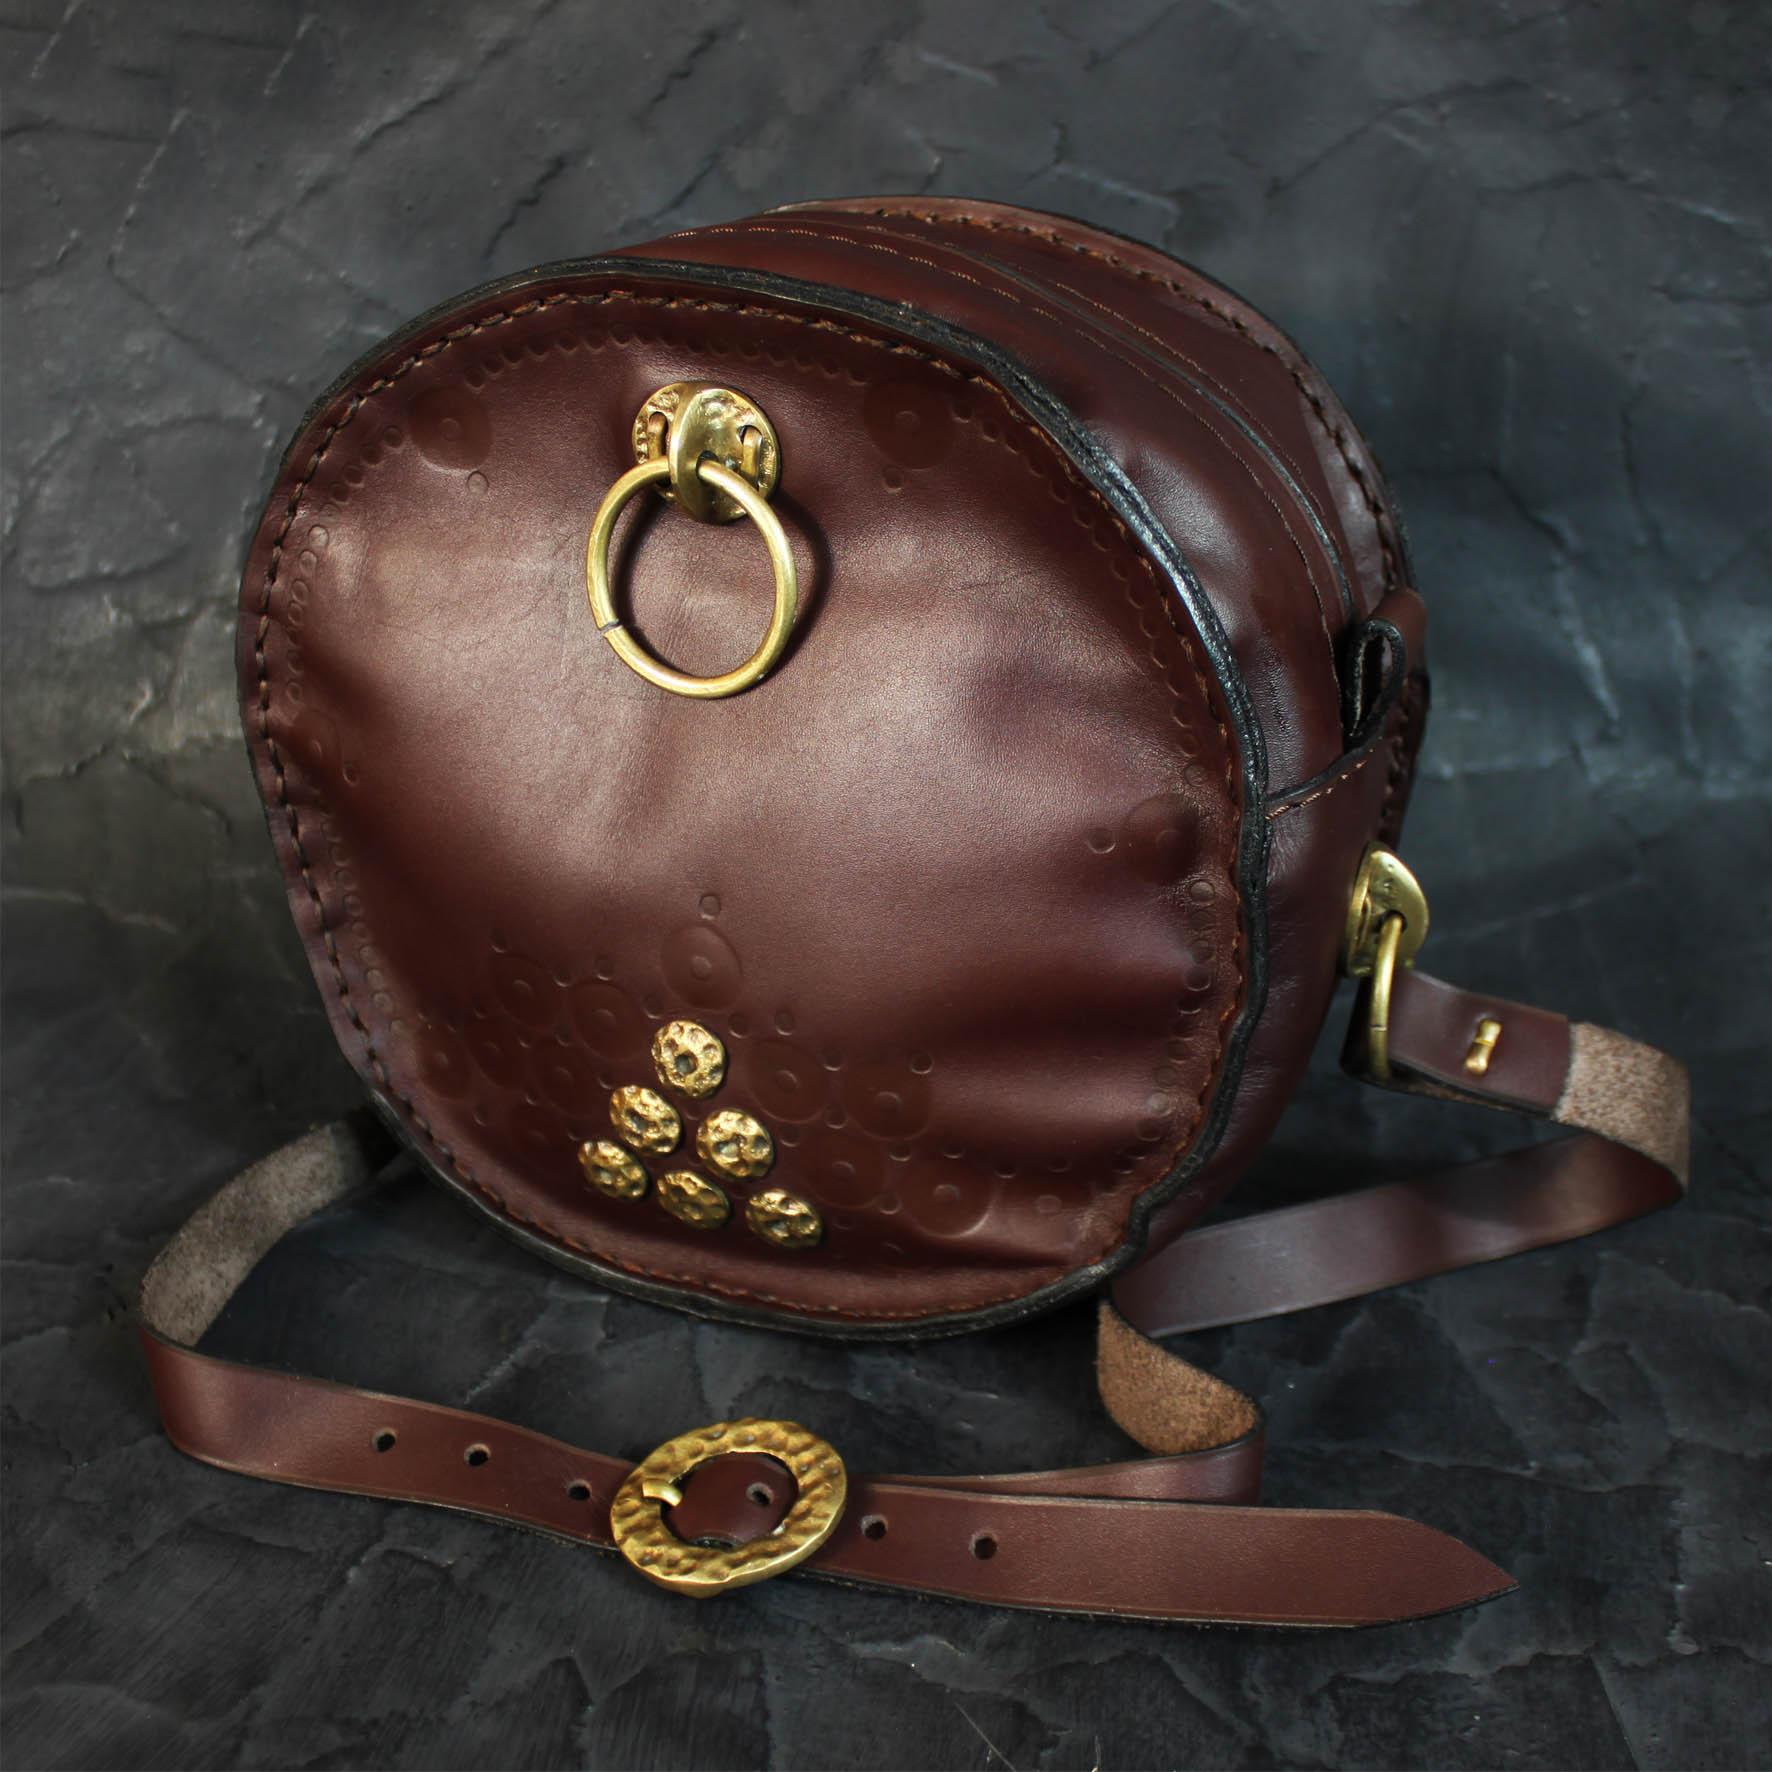 Tabla Bag